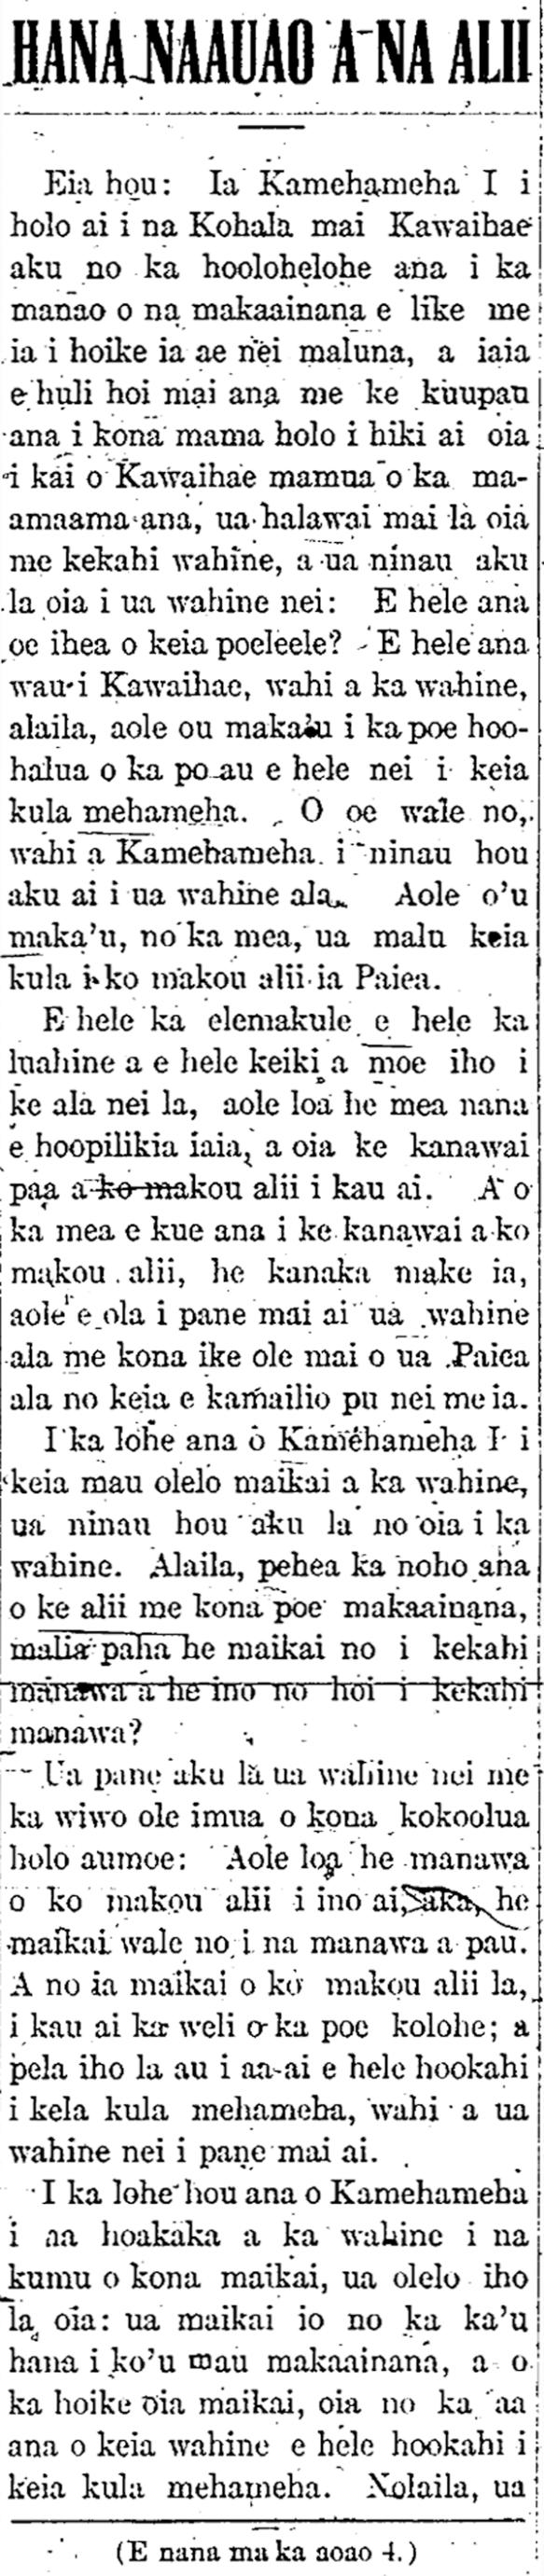 HokuoHawaii_7_1_1909_1.png